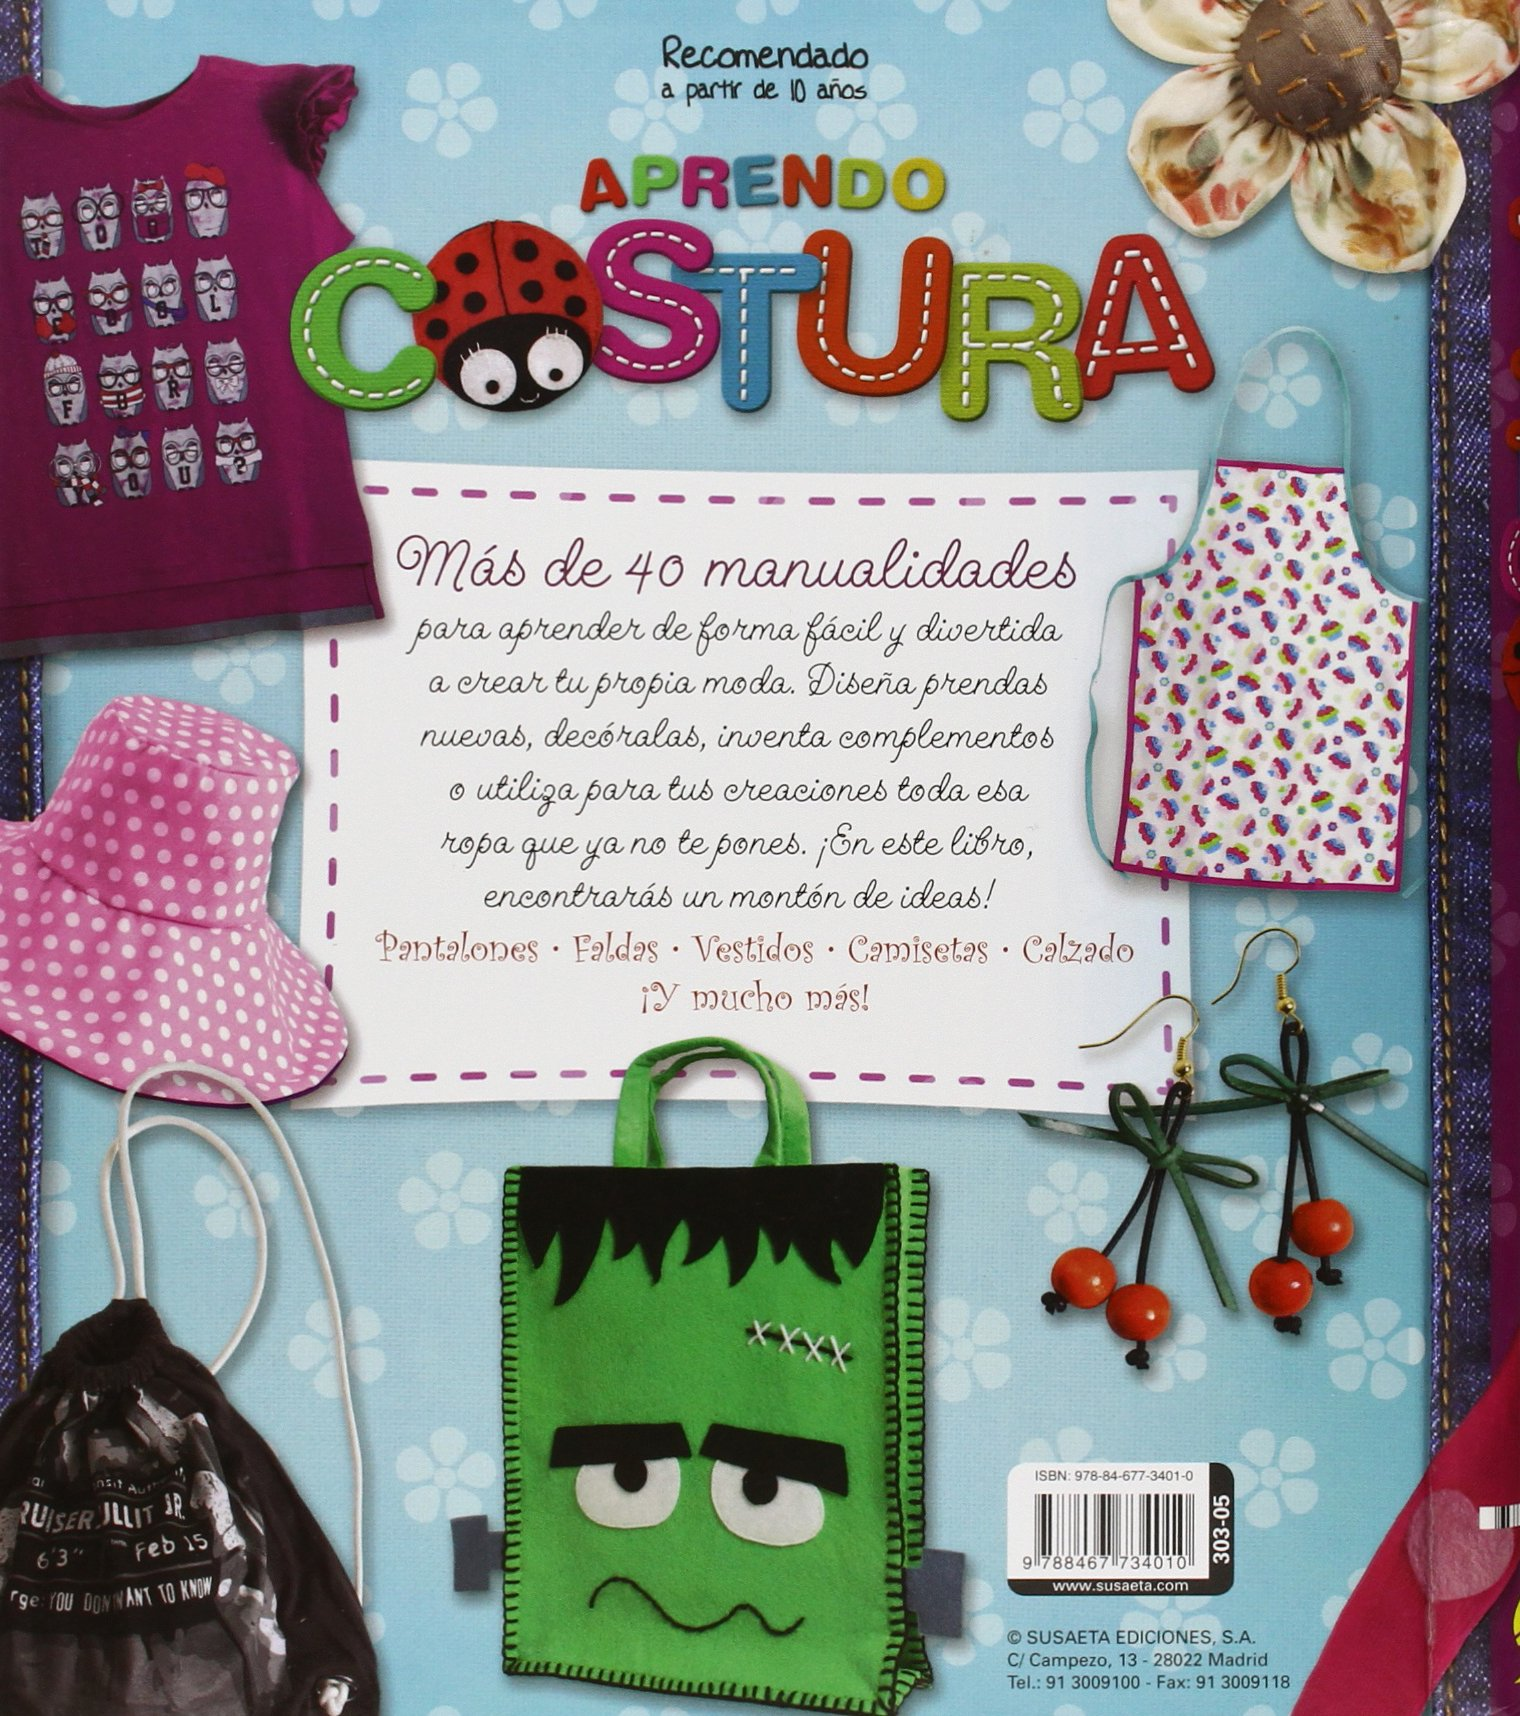 Aprendo costura (100 manualidades): Amazon.es: Sinache, Uriel ...